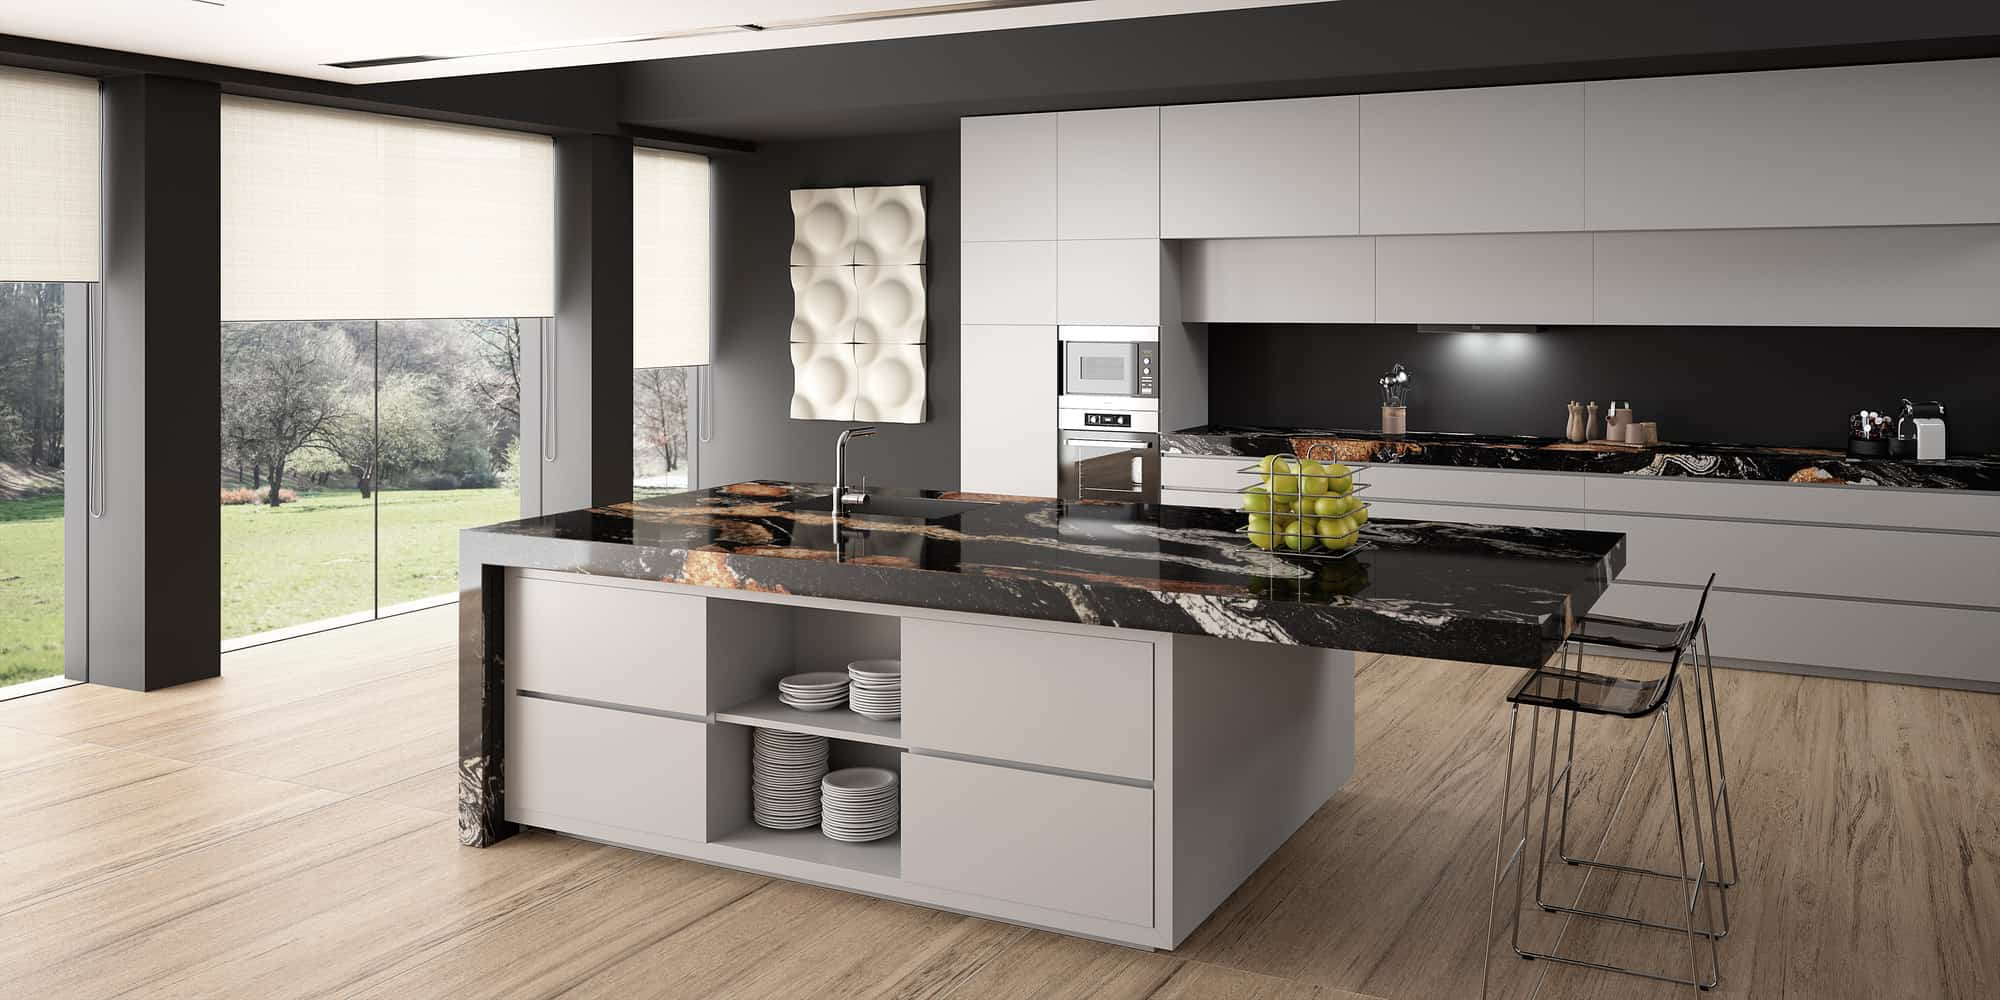 2019 Kitchen Granite Countertops Trends Palazzostone